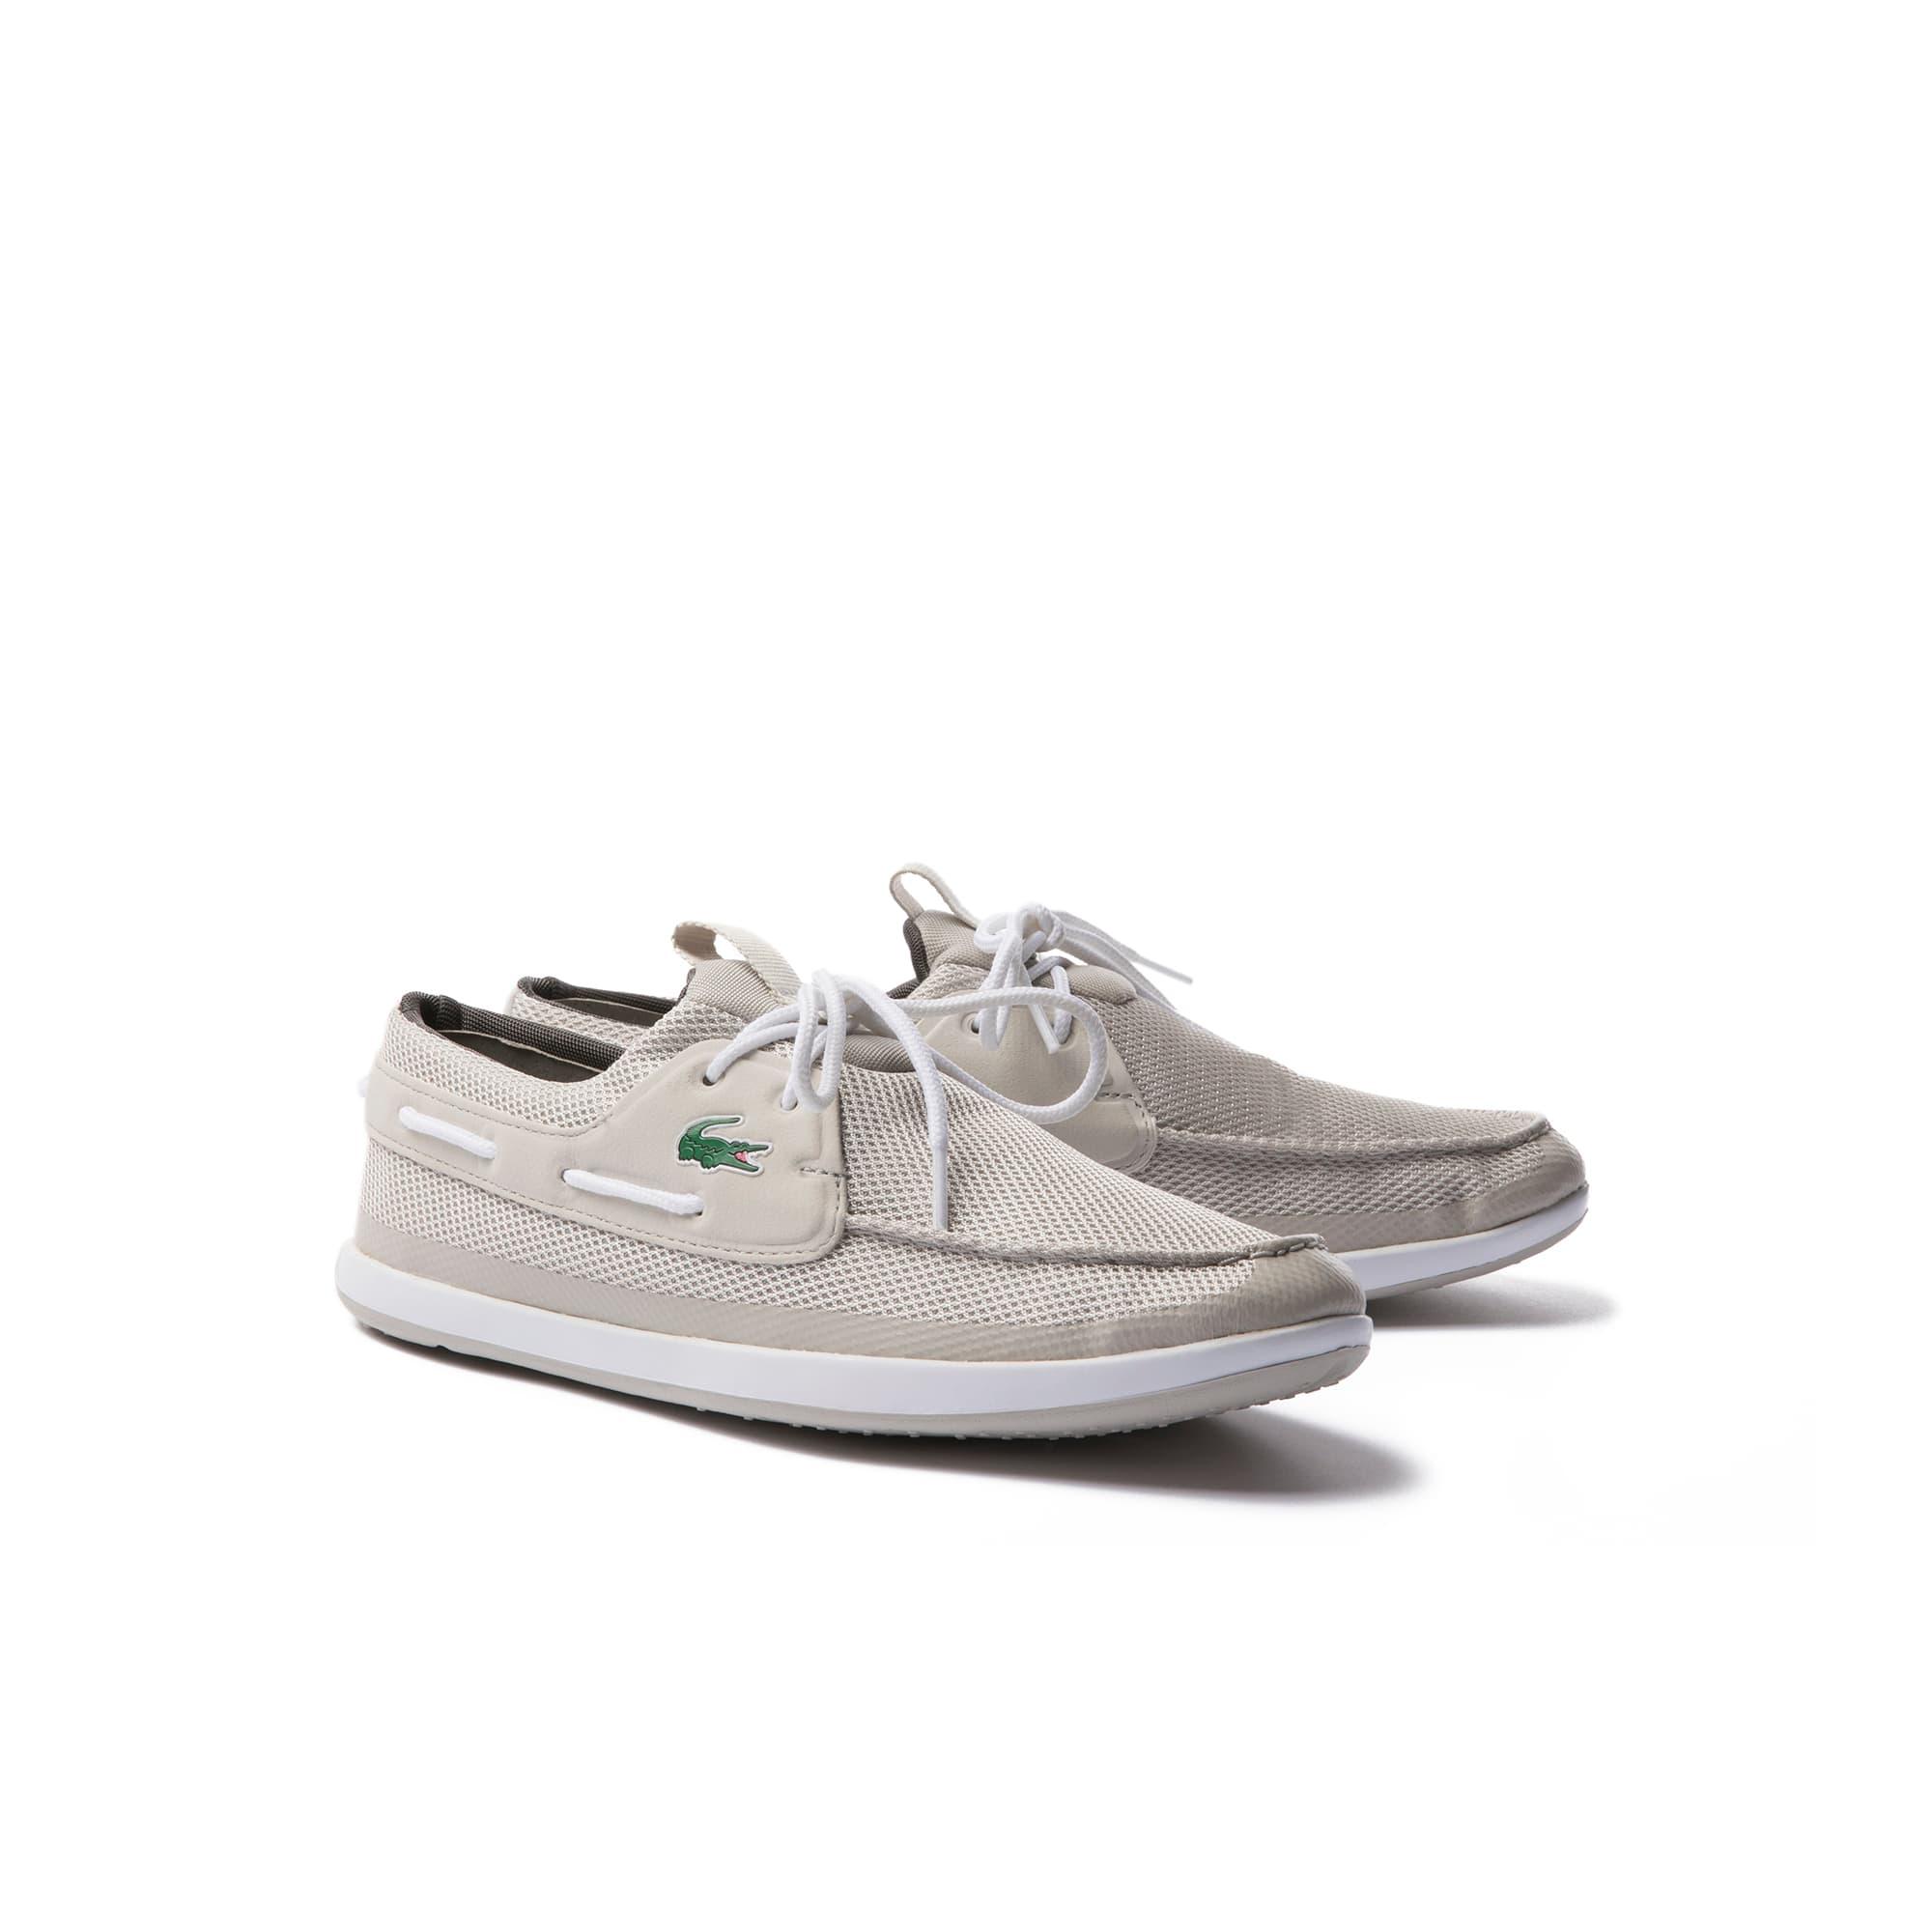 ae646bfcaa22 Men s Landsailing Textile Boat Shoes